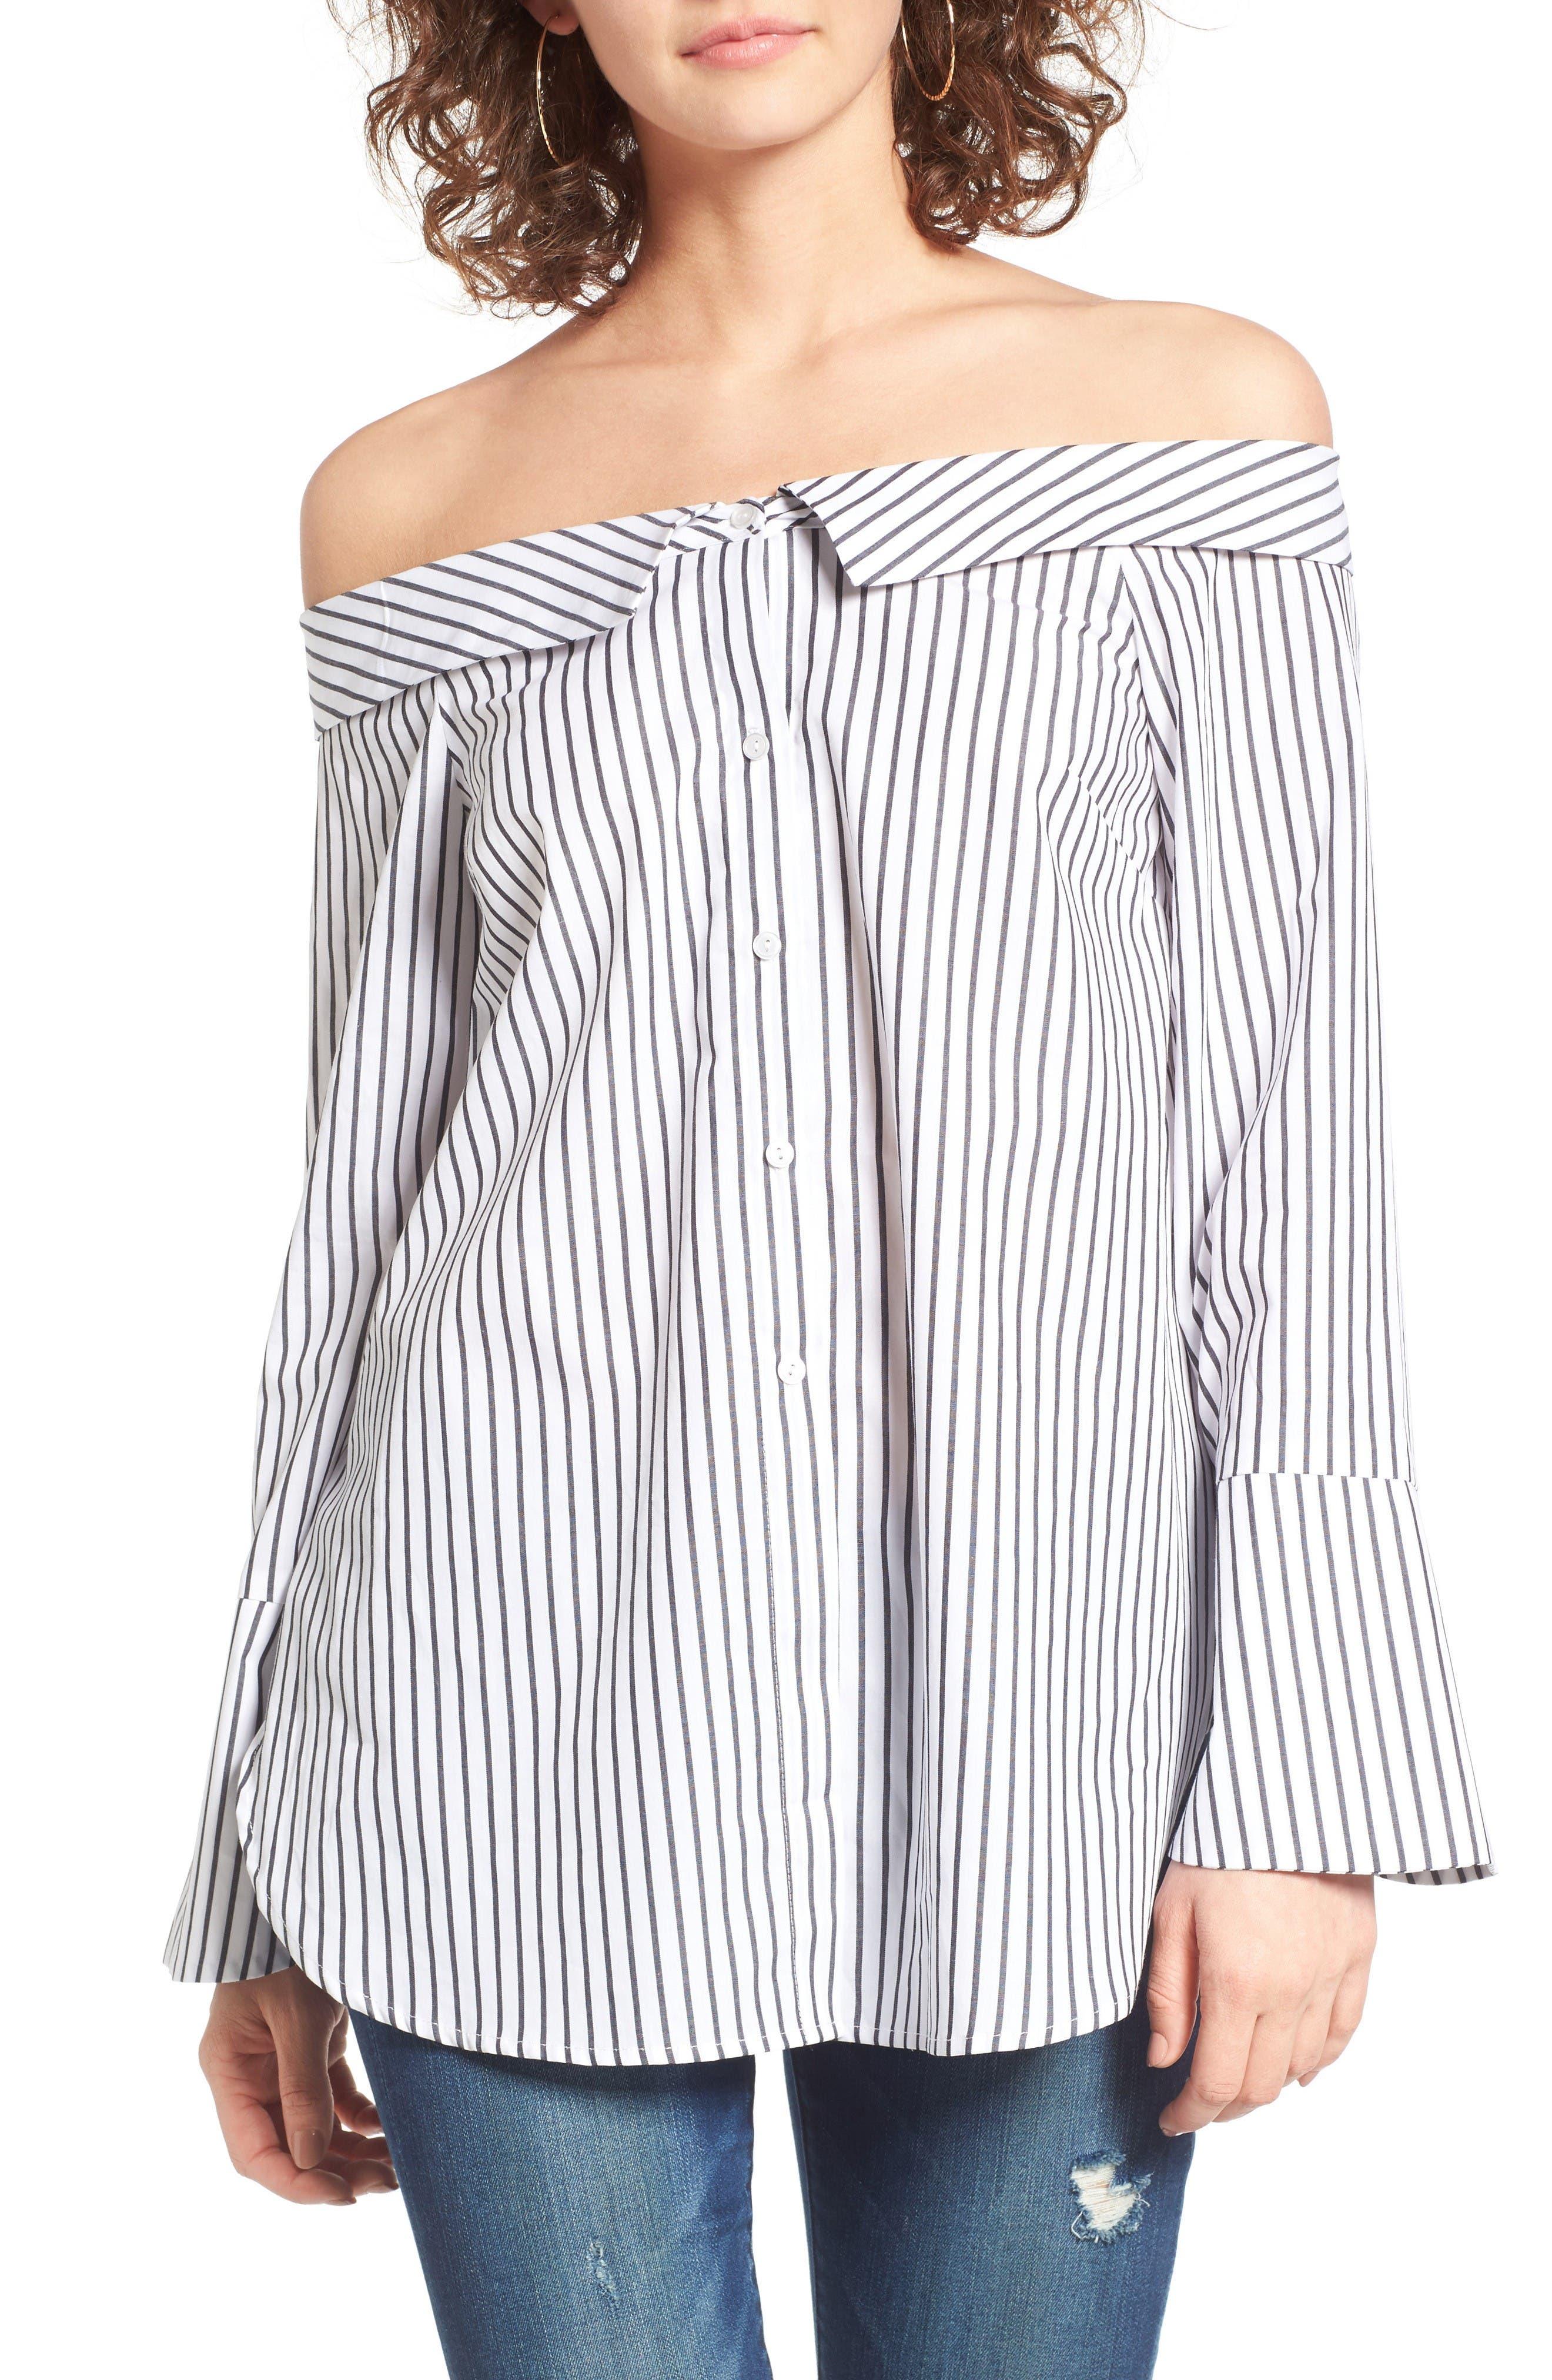 Main Image - Lush Stripe Off the Shoulder Top